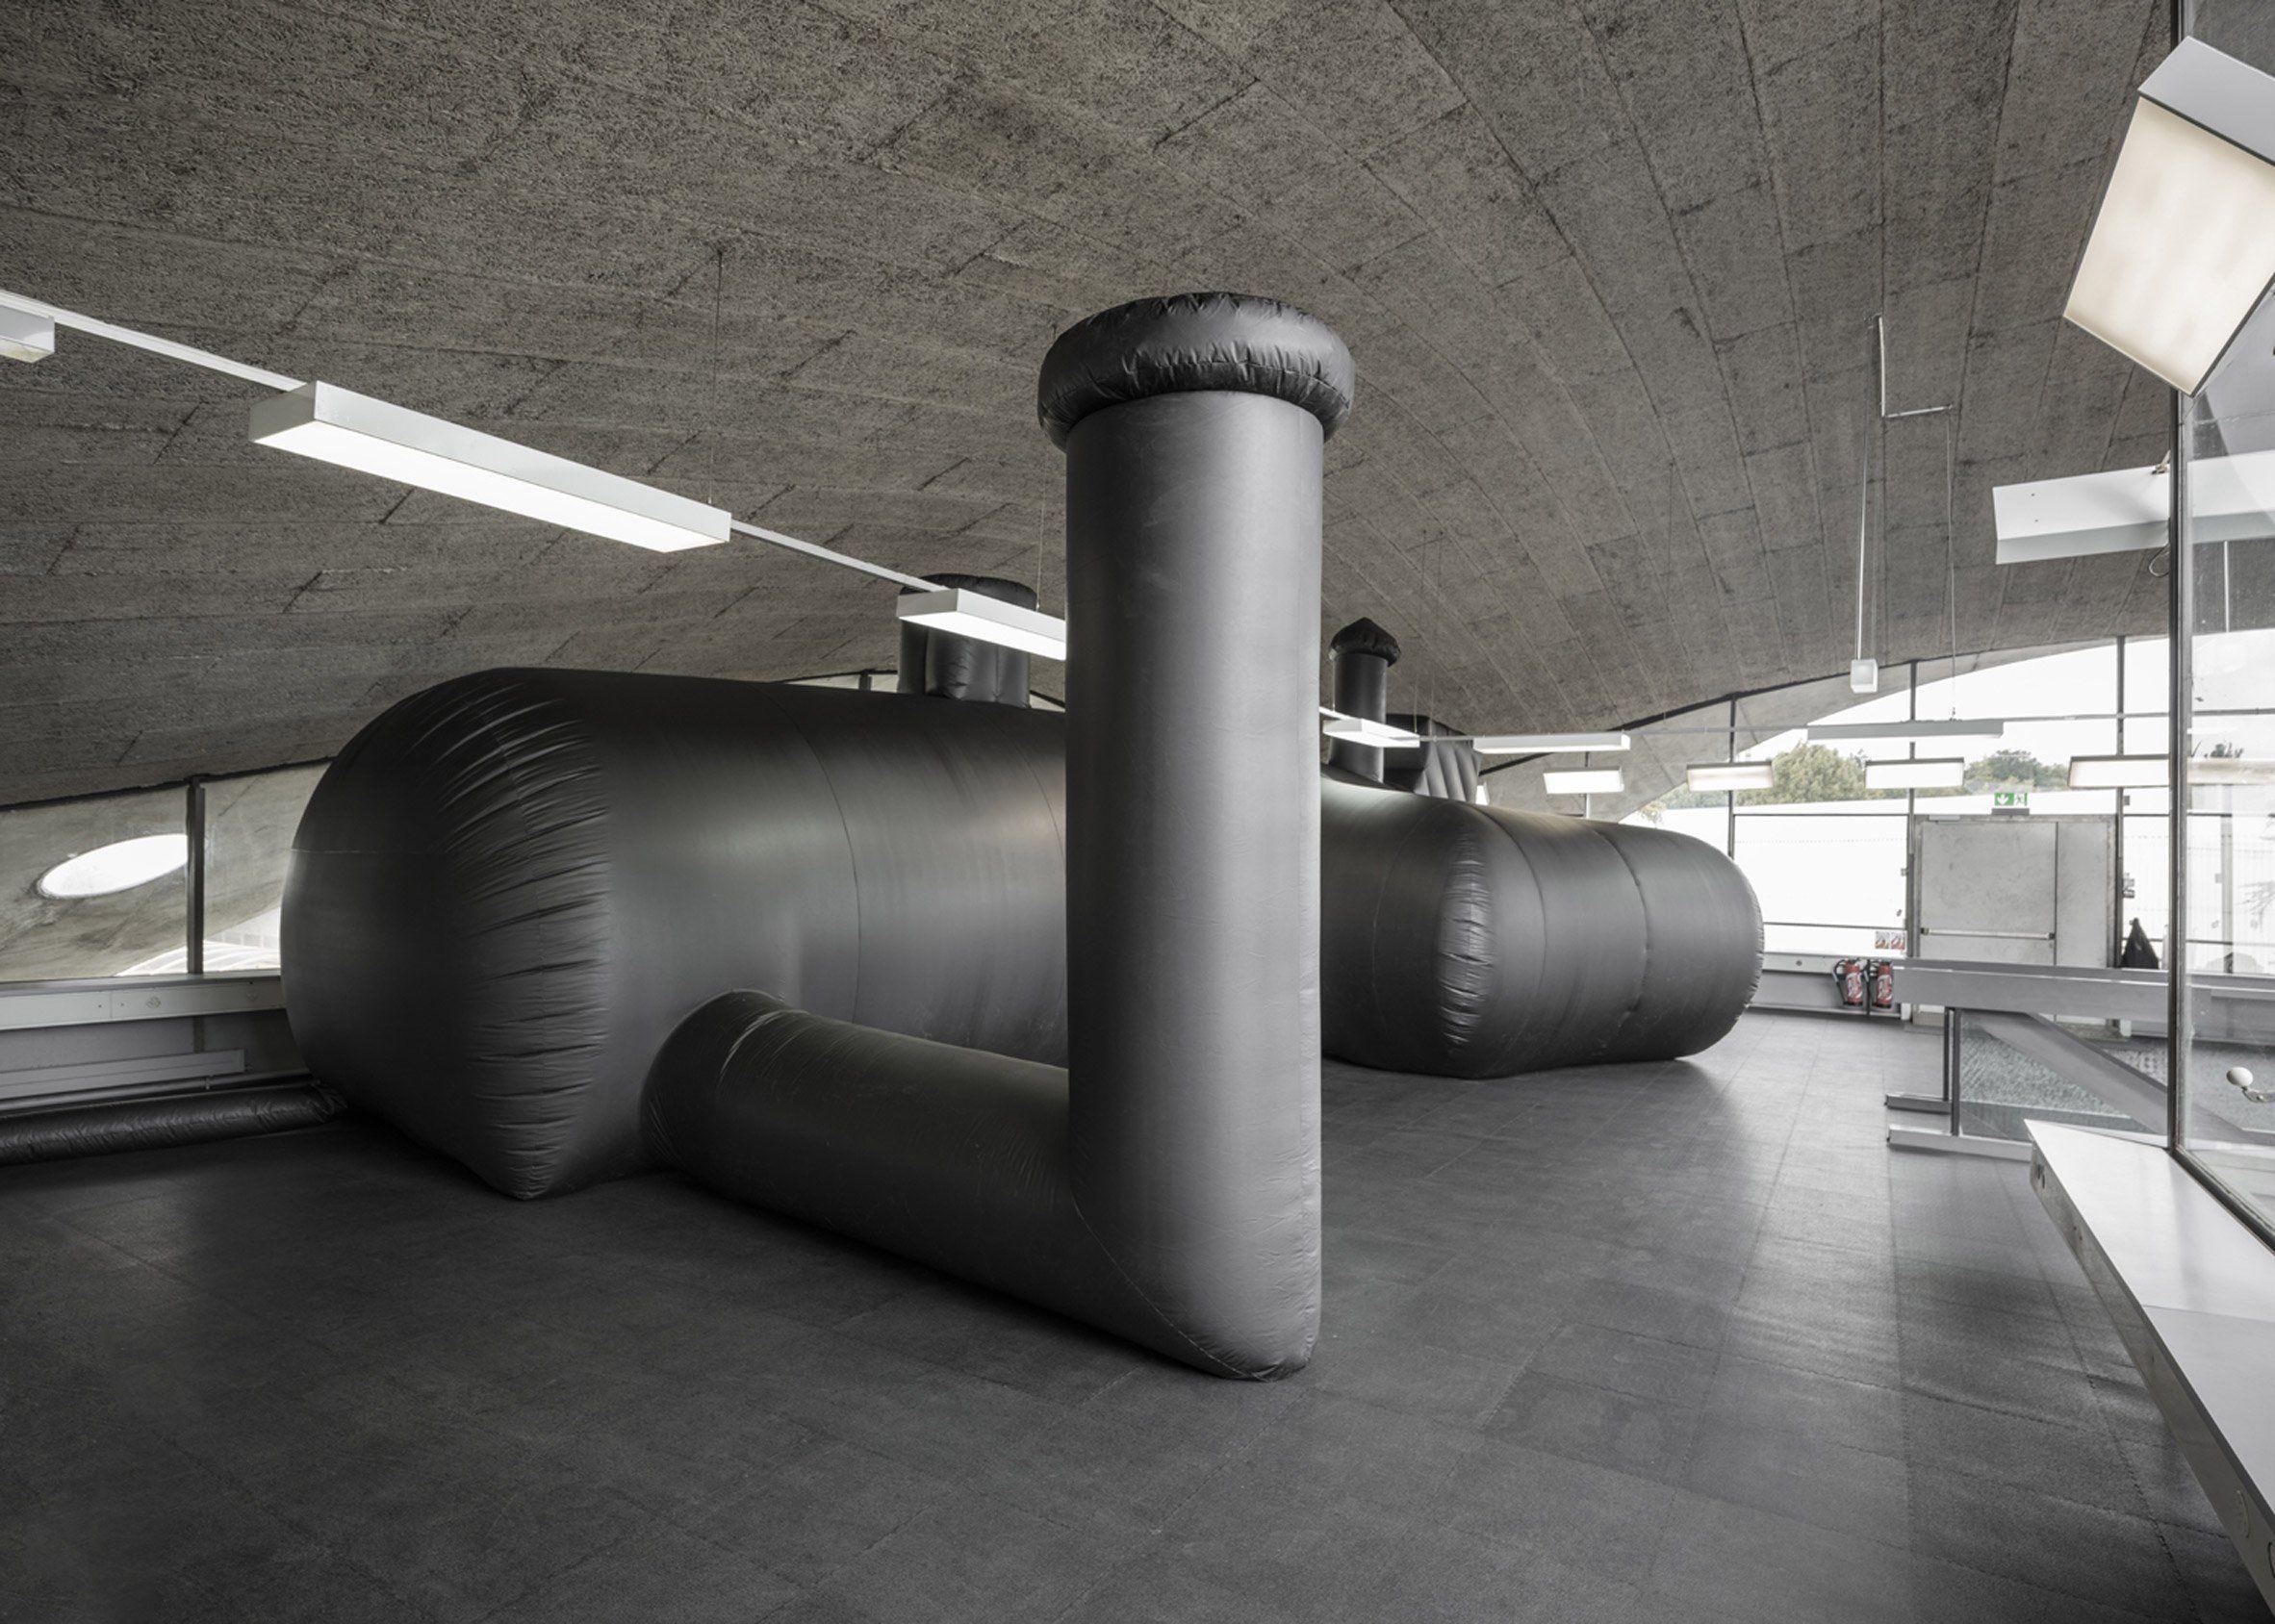 Shelter architecture black inflatable installation pvc bureau